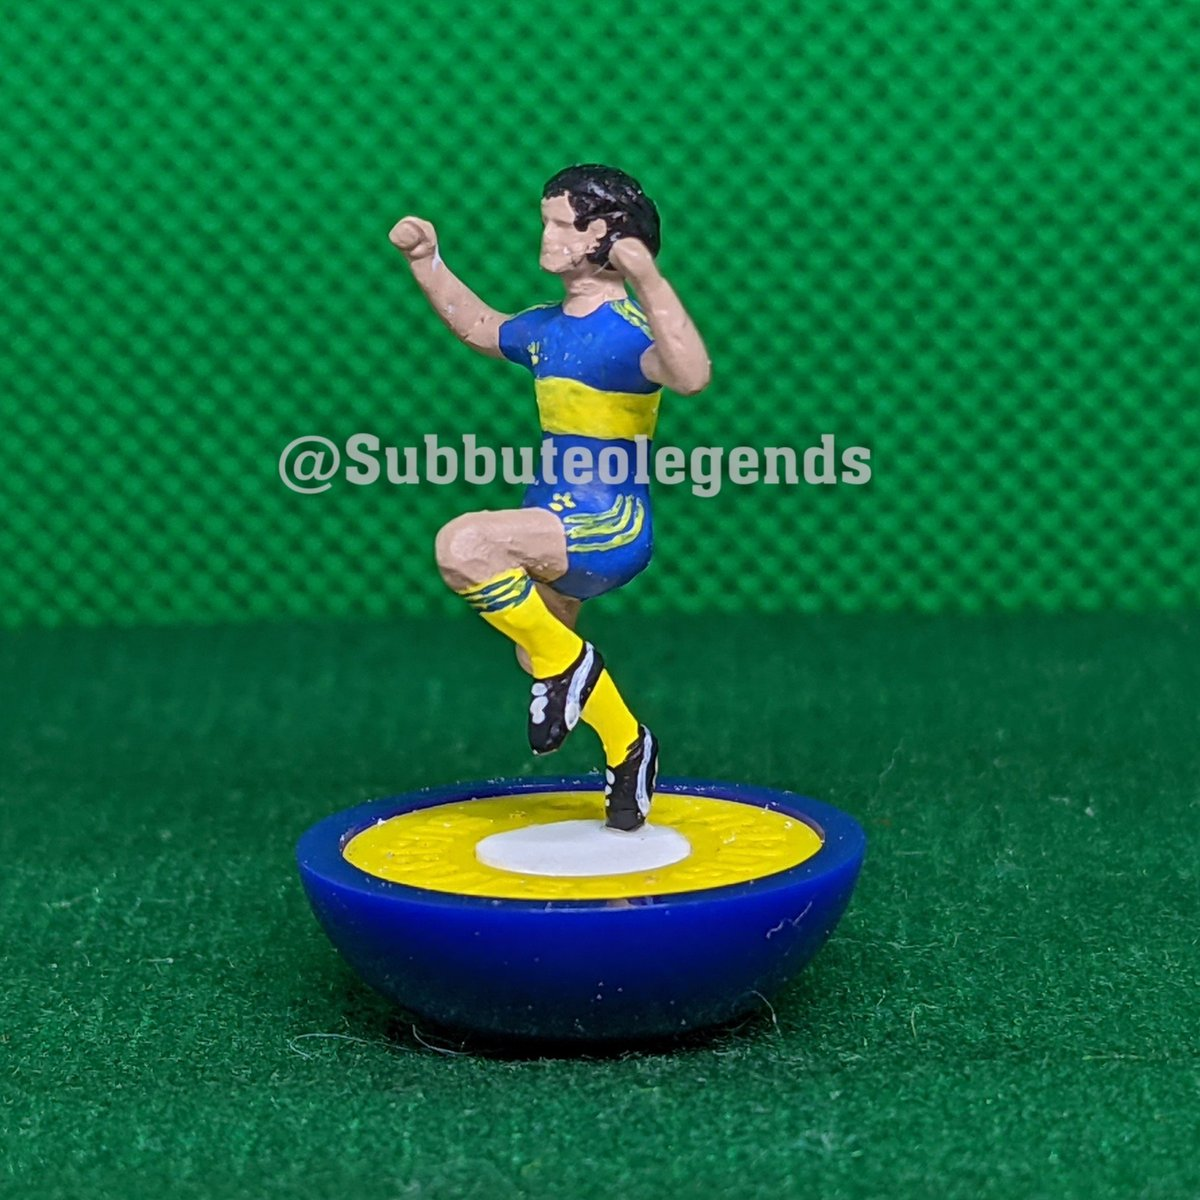 Player: Diego Maradona Team: Boca Juniors Moment: Maradona had two spells with his beloved Boca and won the league title once 1981 Subbuteo recreation. #Subbuteo #Subbuteolegends  #subbuteoart #handmade #hobby #handpainted #football #soccer  #BocaJuniors #DiegoMaradona #Maradona